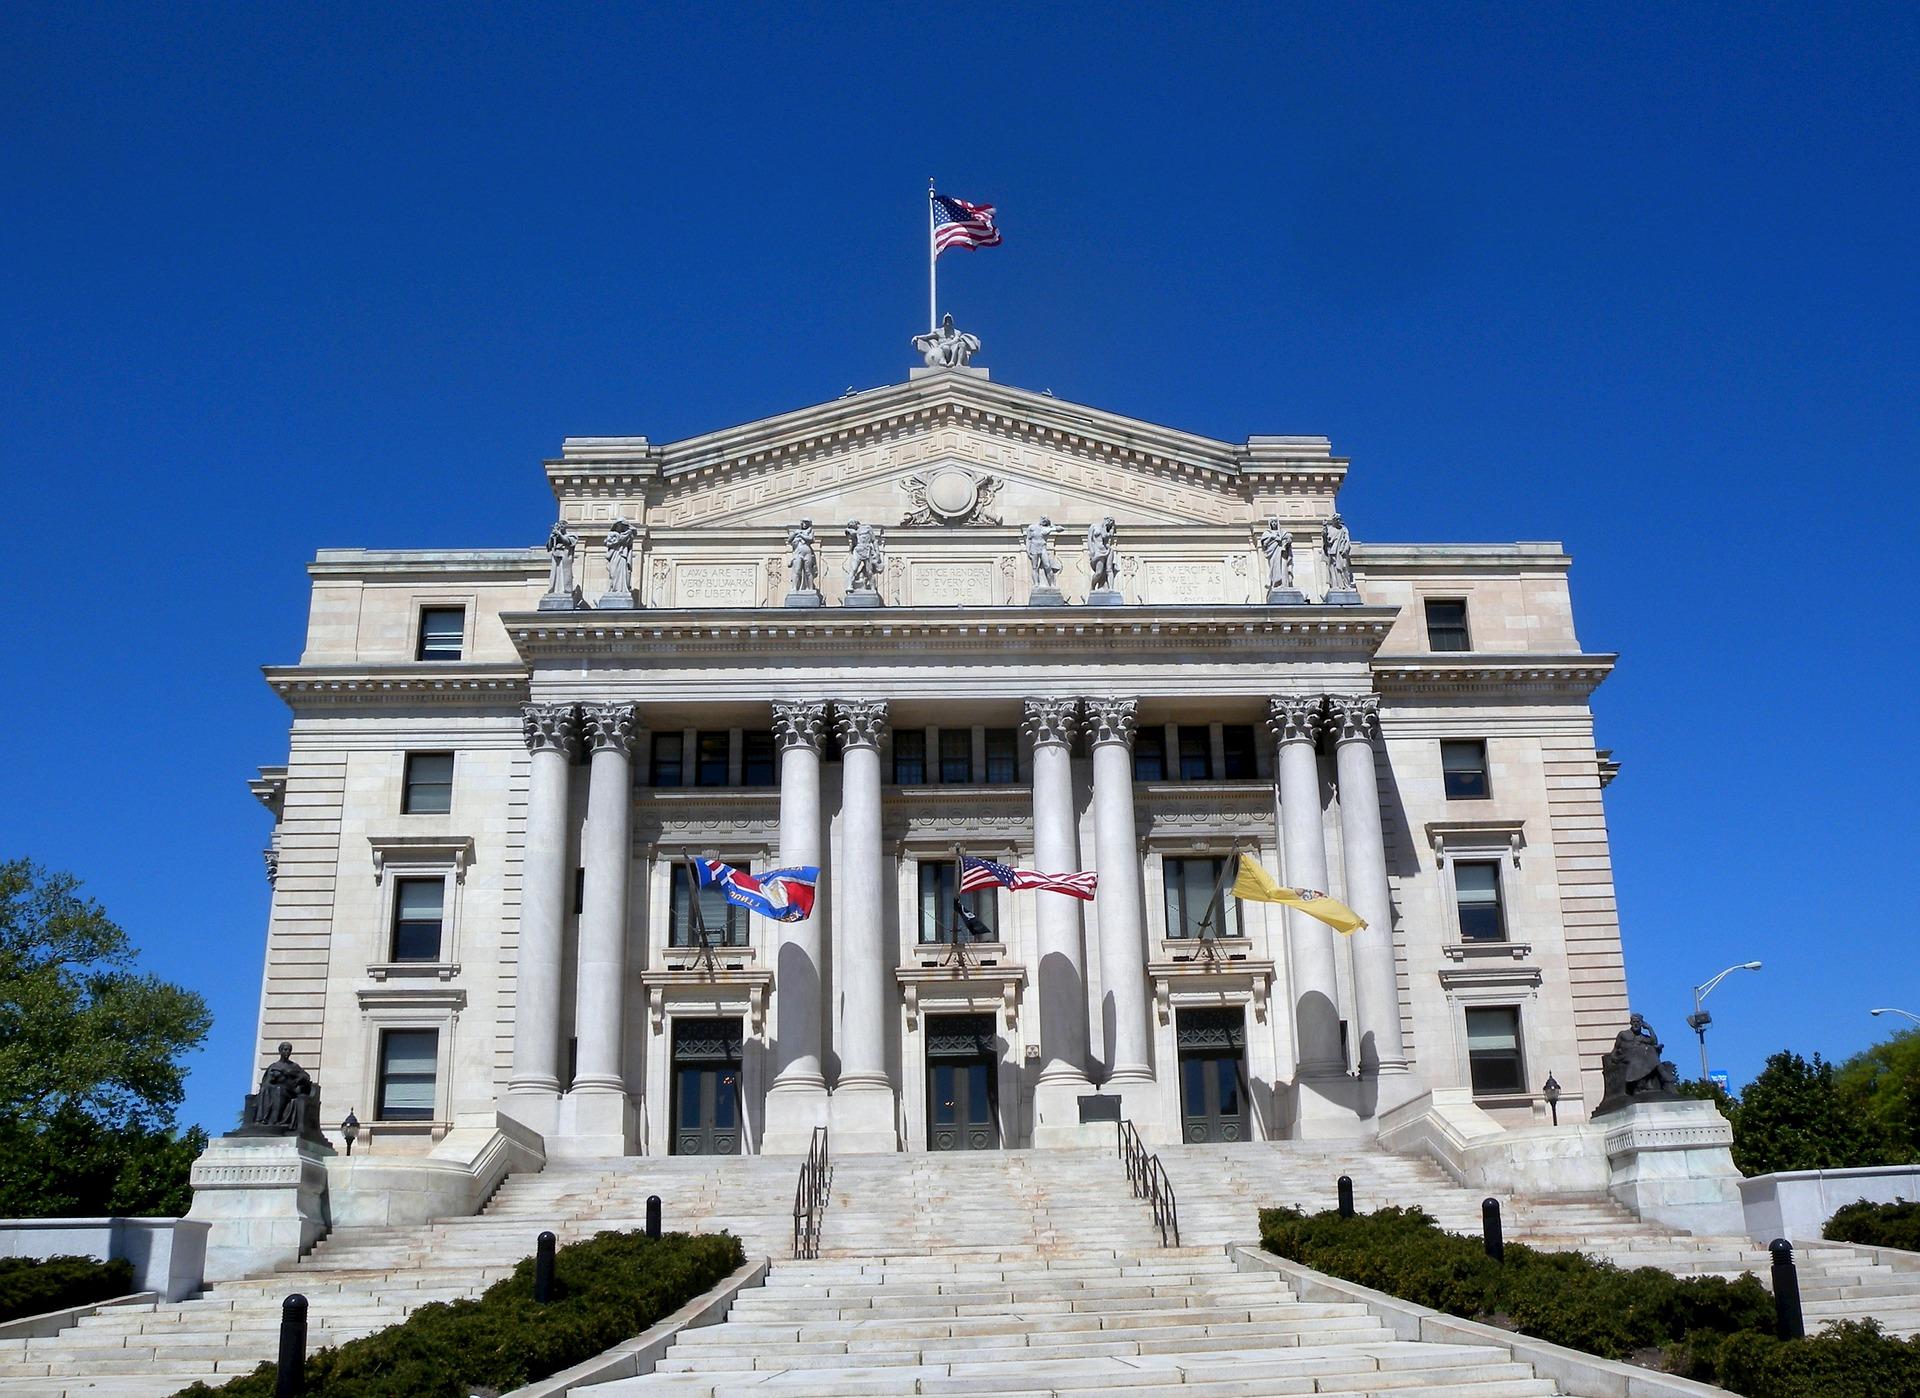 New Jersey Slot Machine Casino Gambling - Essex County Courthouse in Newark, New Jersey.